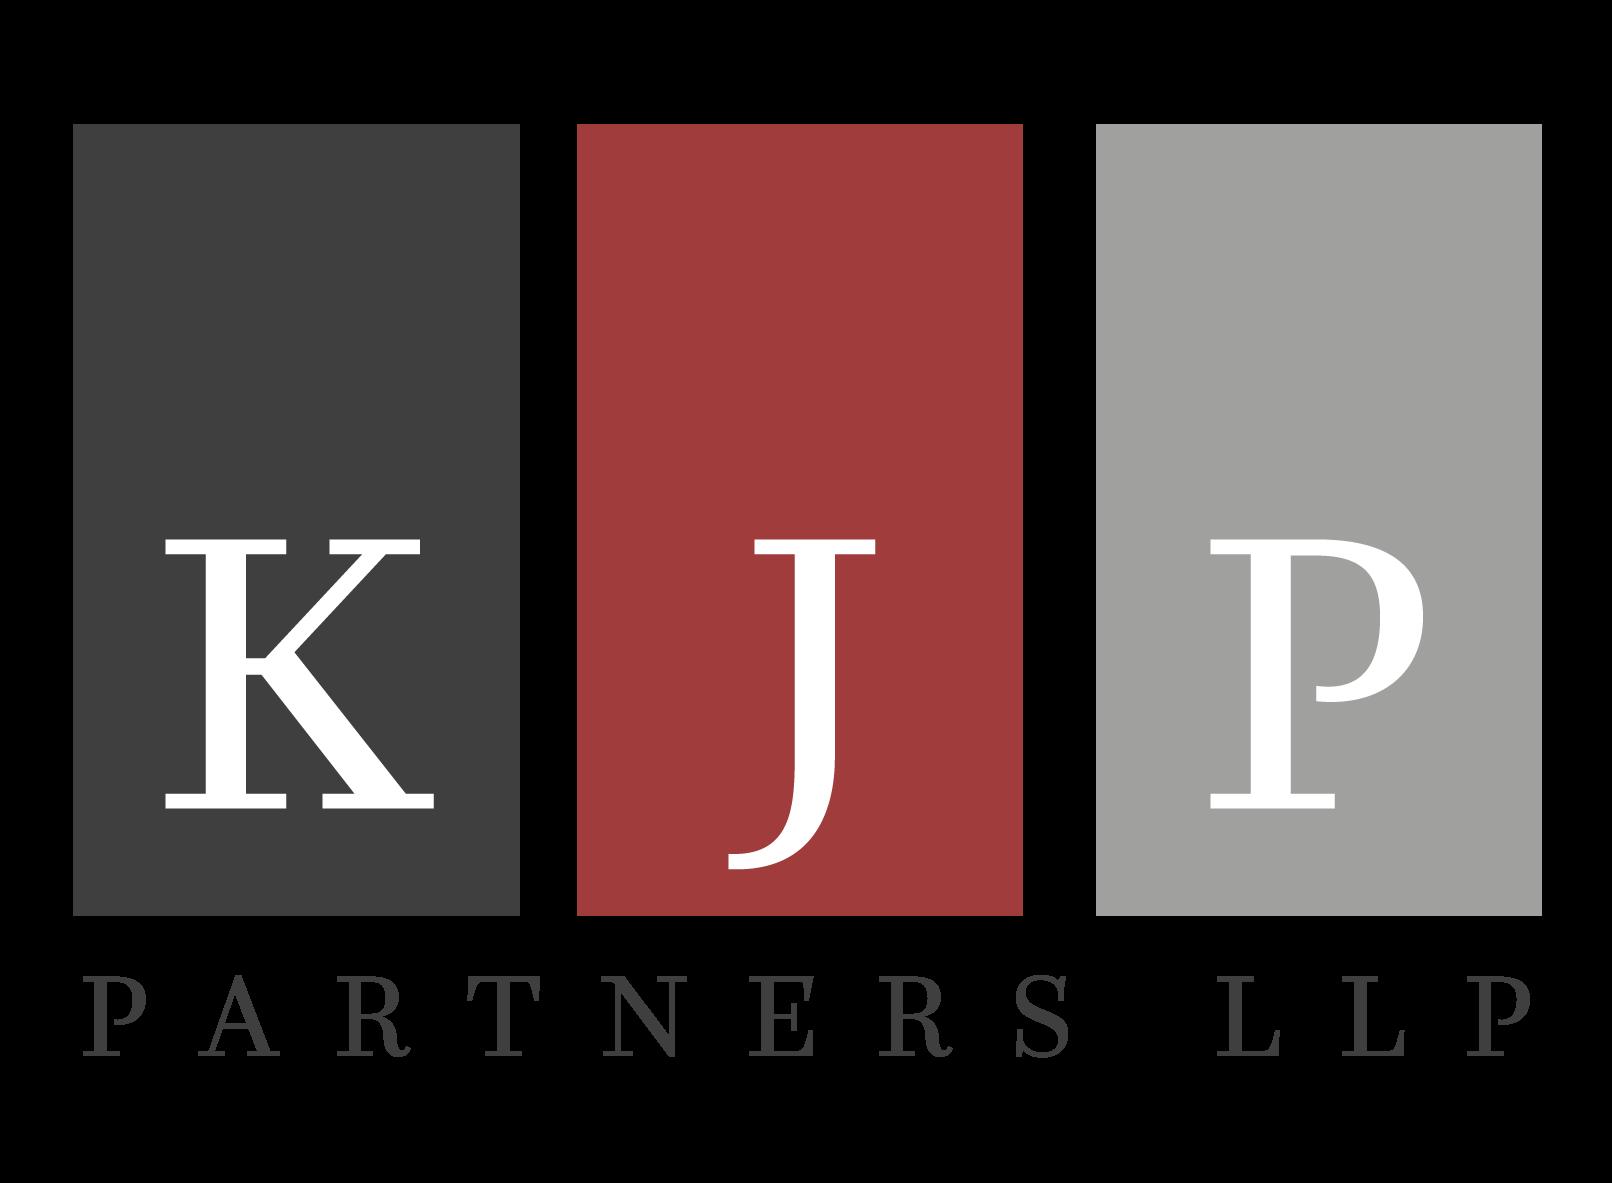 KJP_logo_final.png